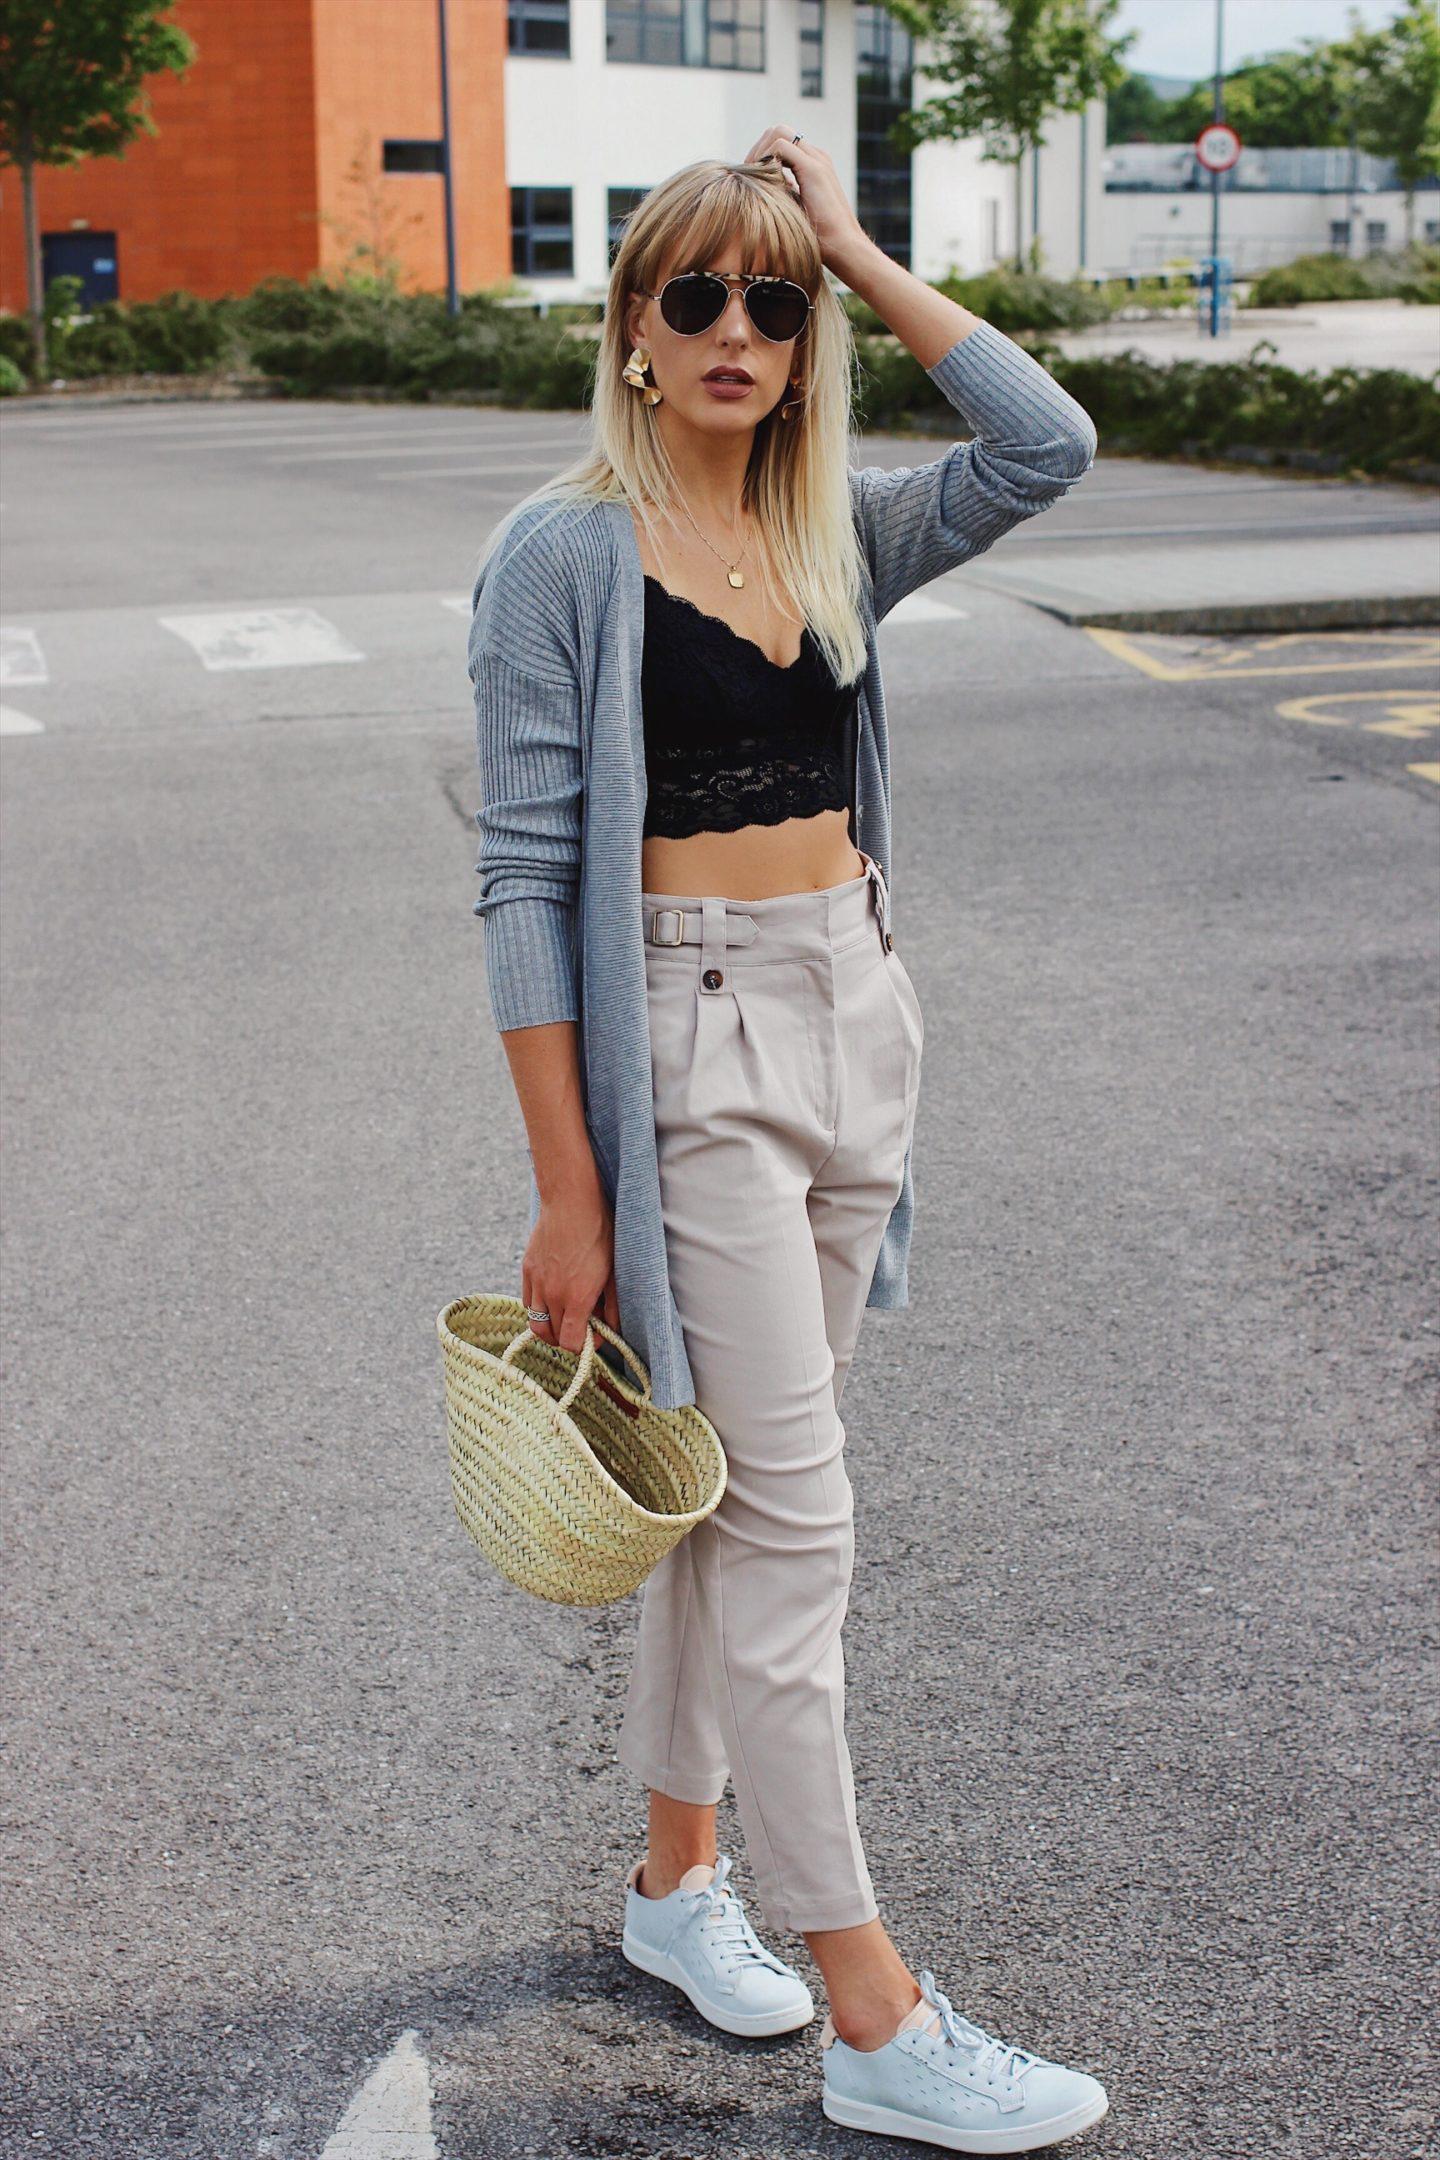 Charlotte Buttrick high street style blogger wearing next new season